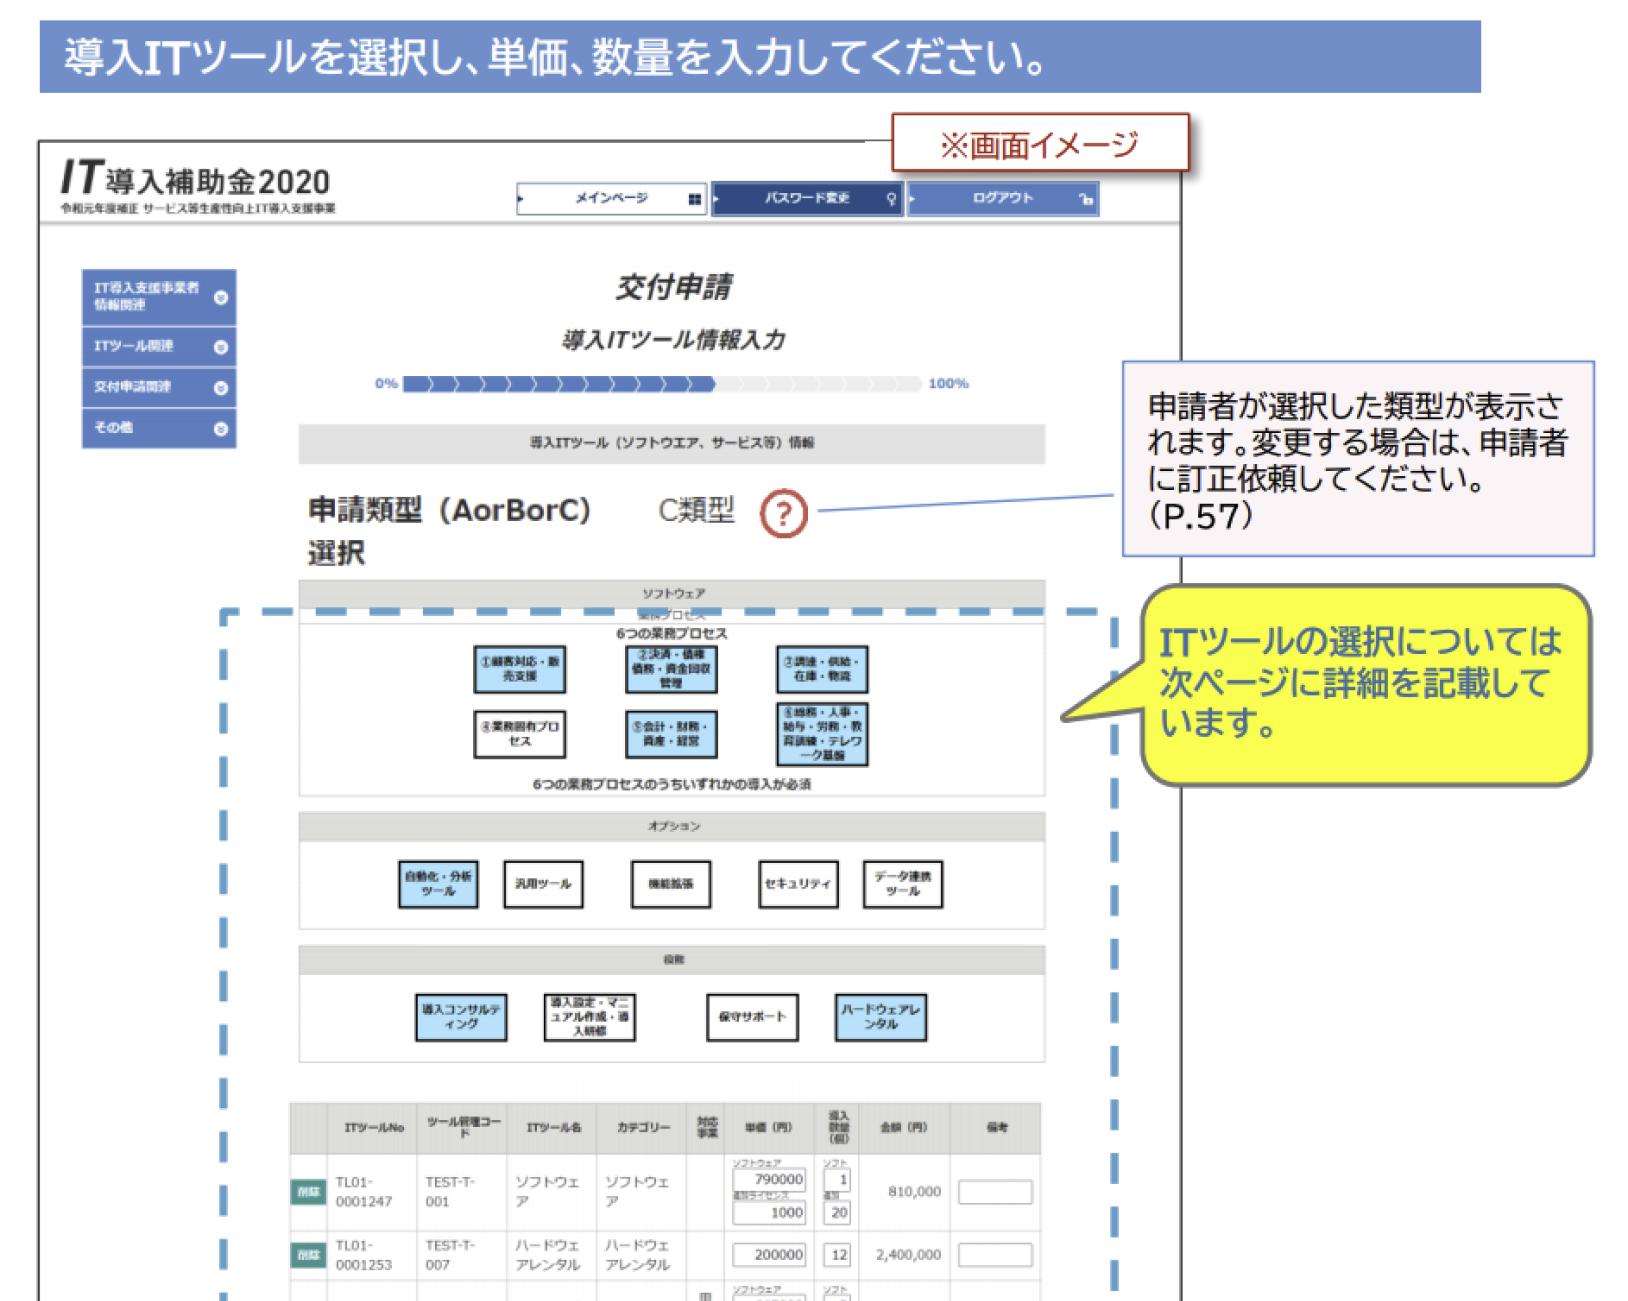 IT導入補助金交付申請ツール情報入力のスクリーンショット